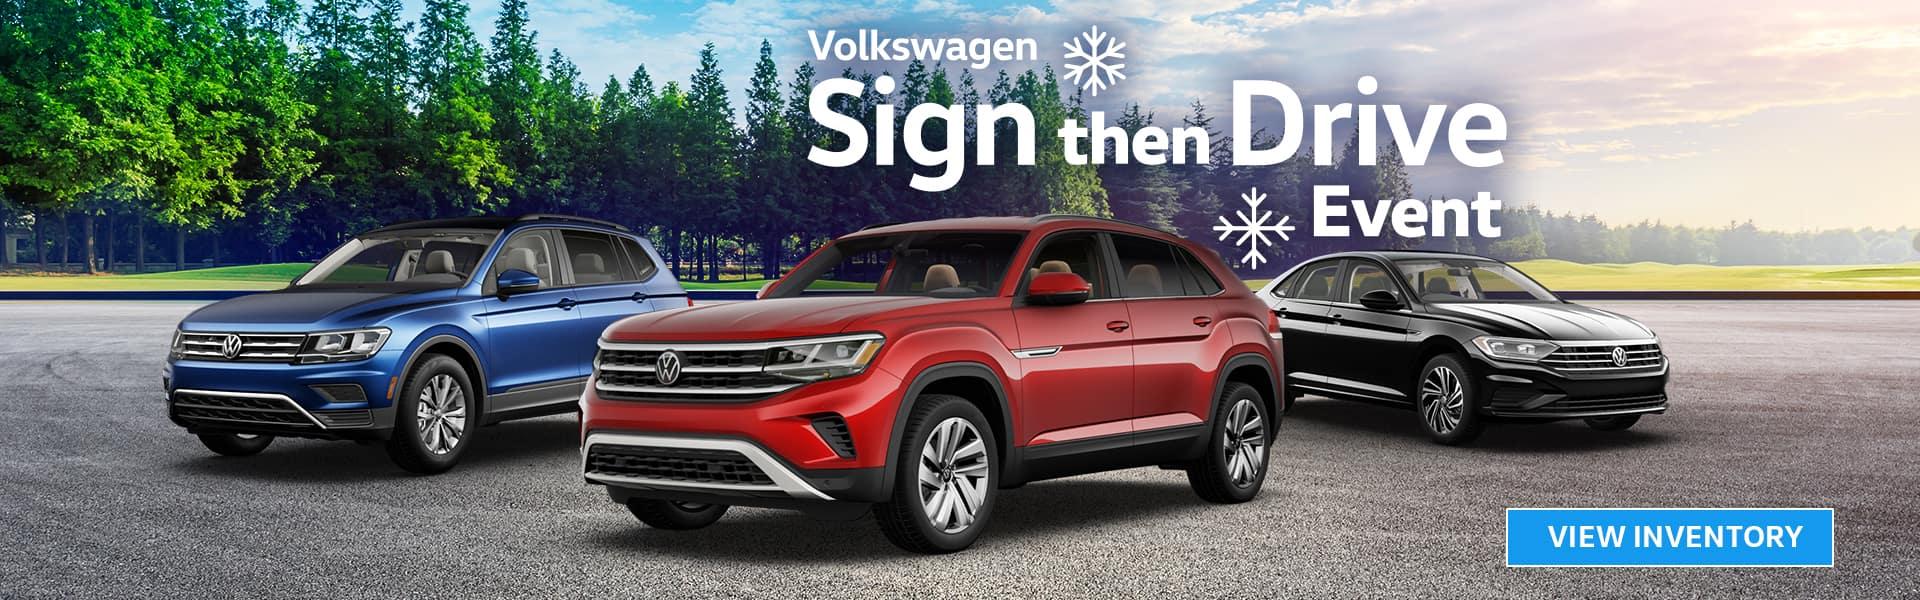 VW Sales Event | Volkswagen Sign Then Drive Event